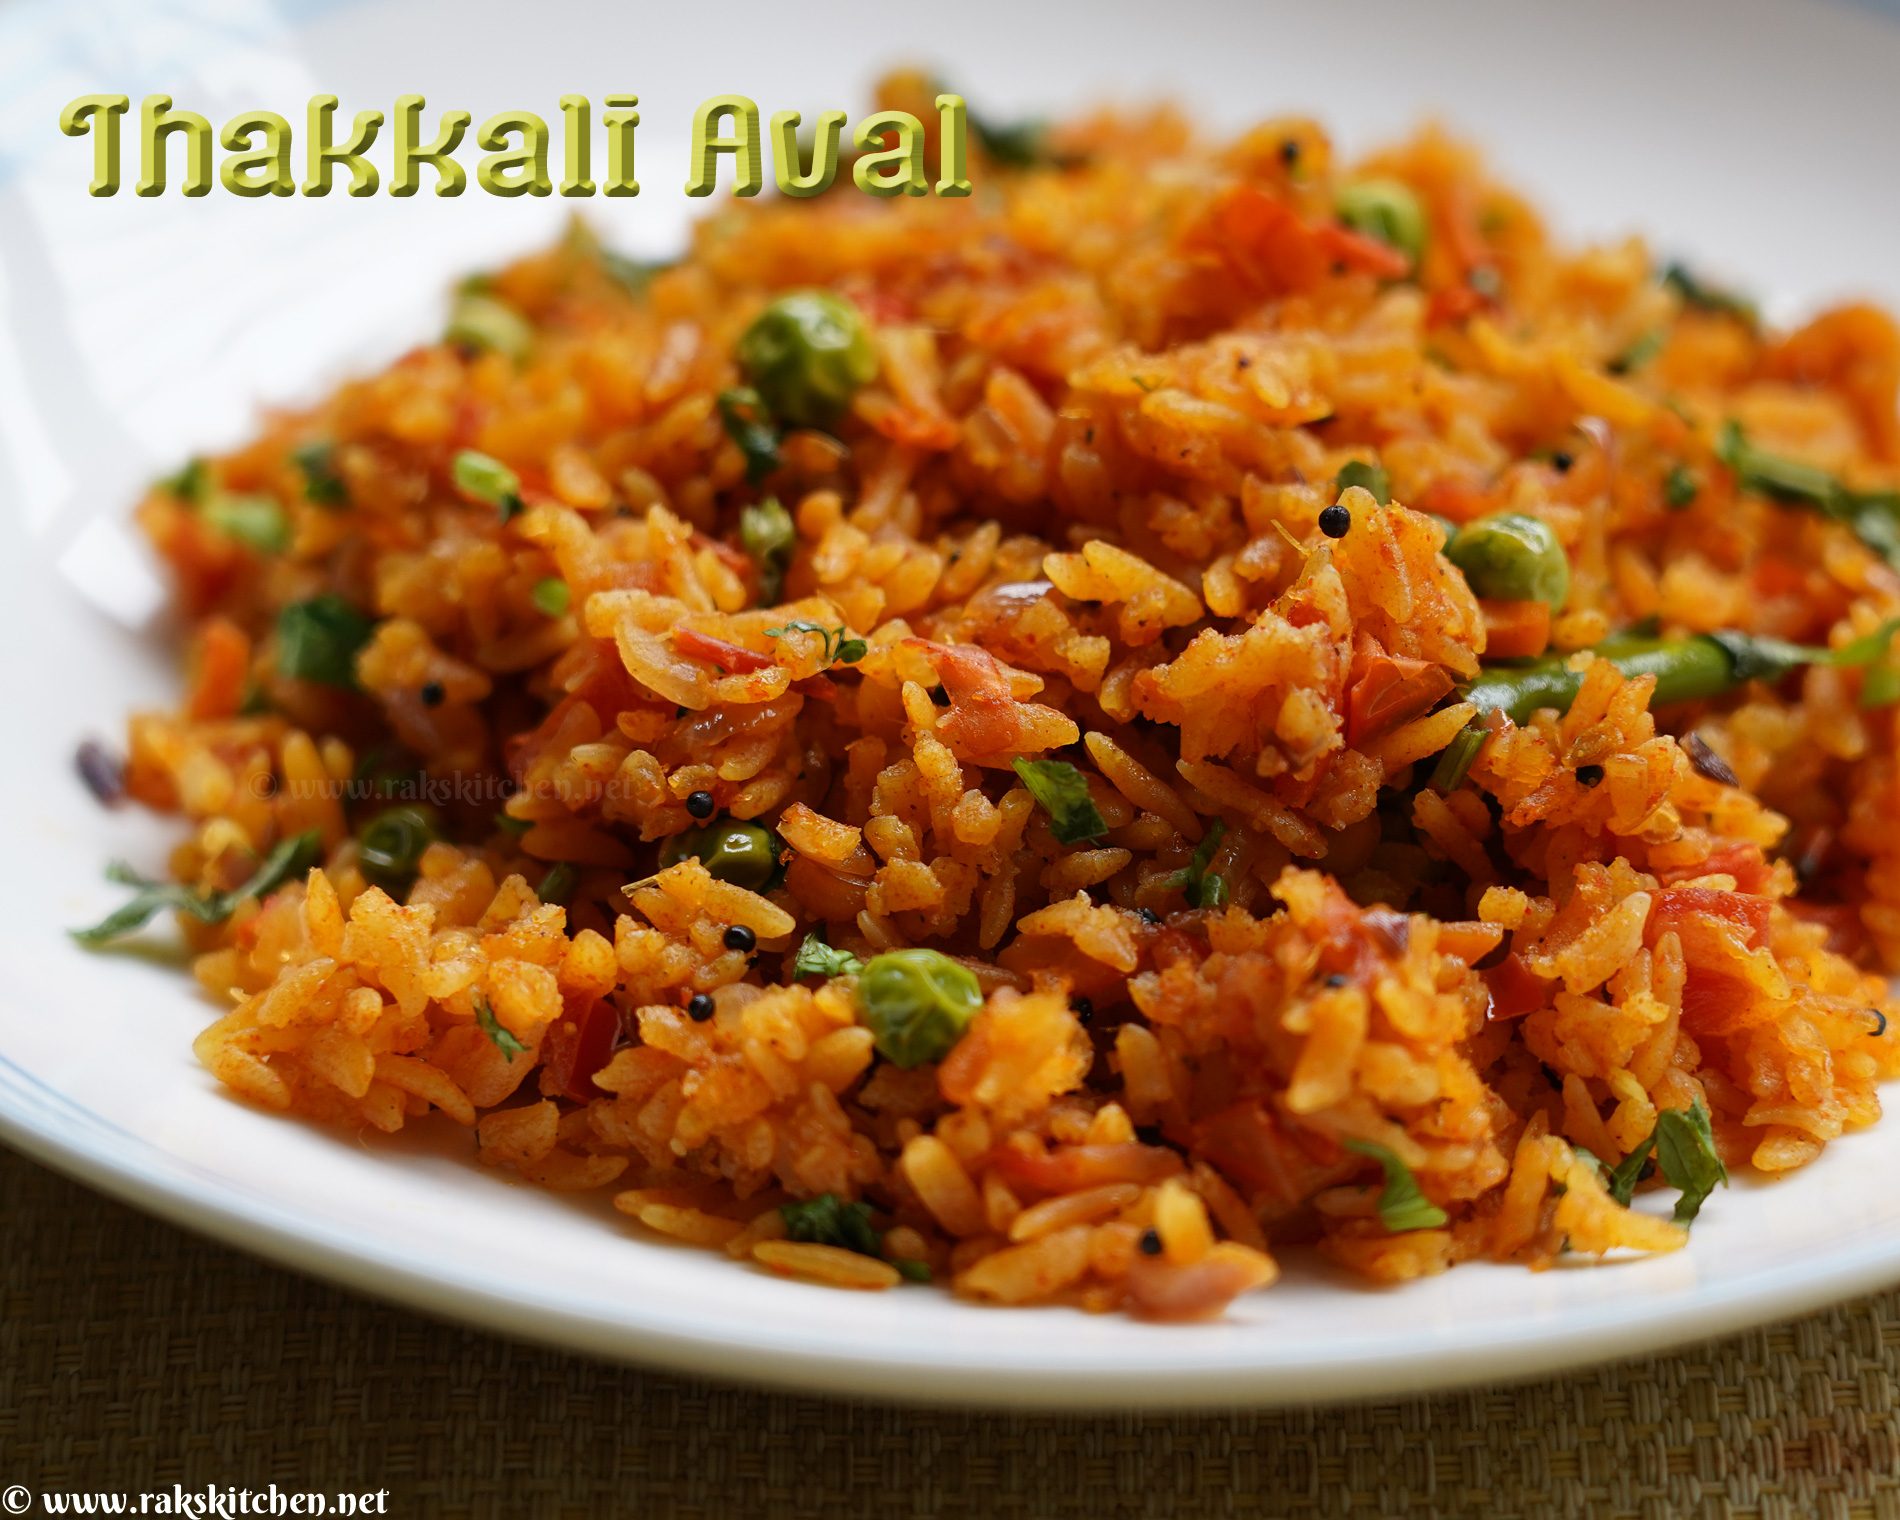 Tomato poha, tomato aval recipe | Indian breakfast recipes